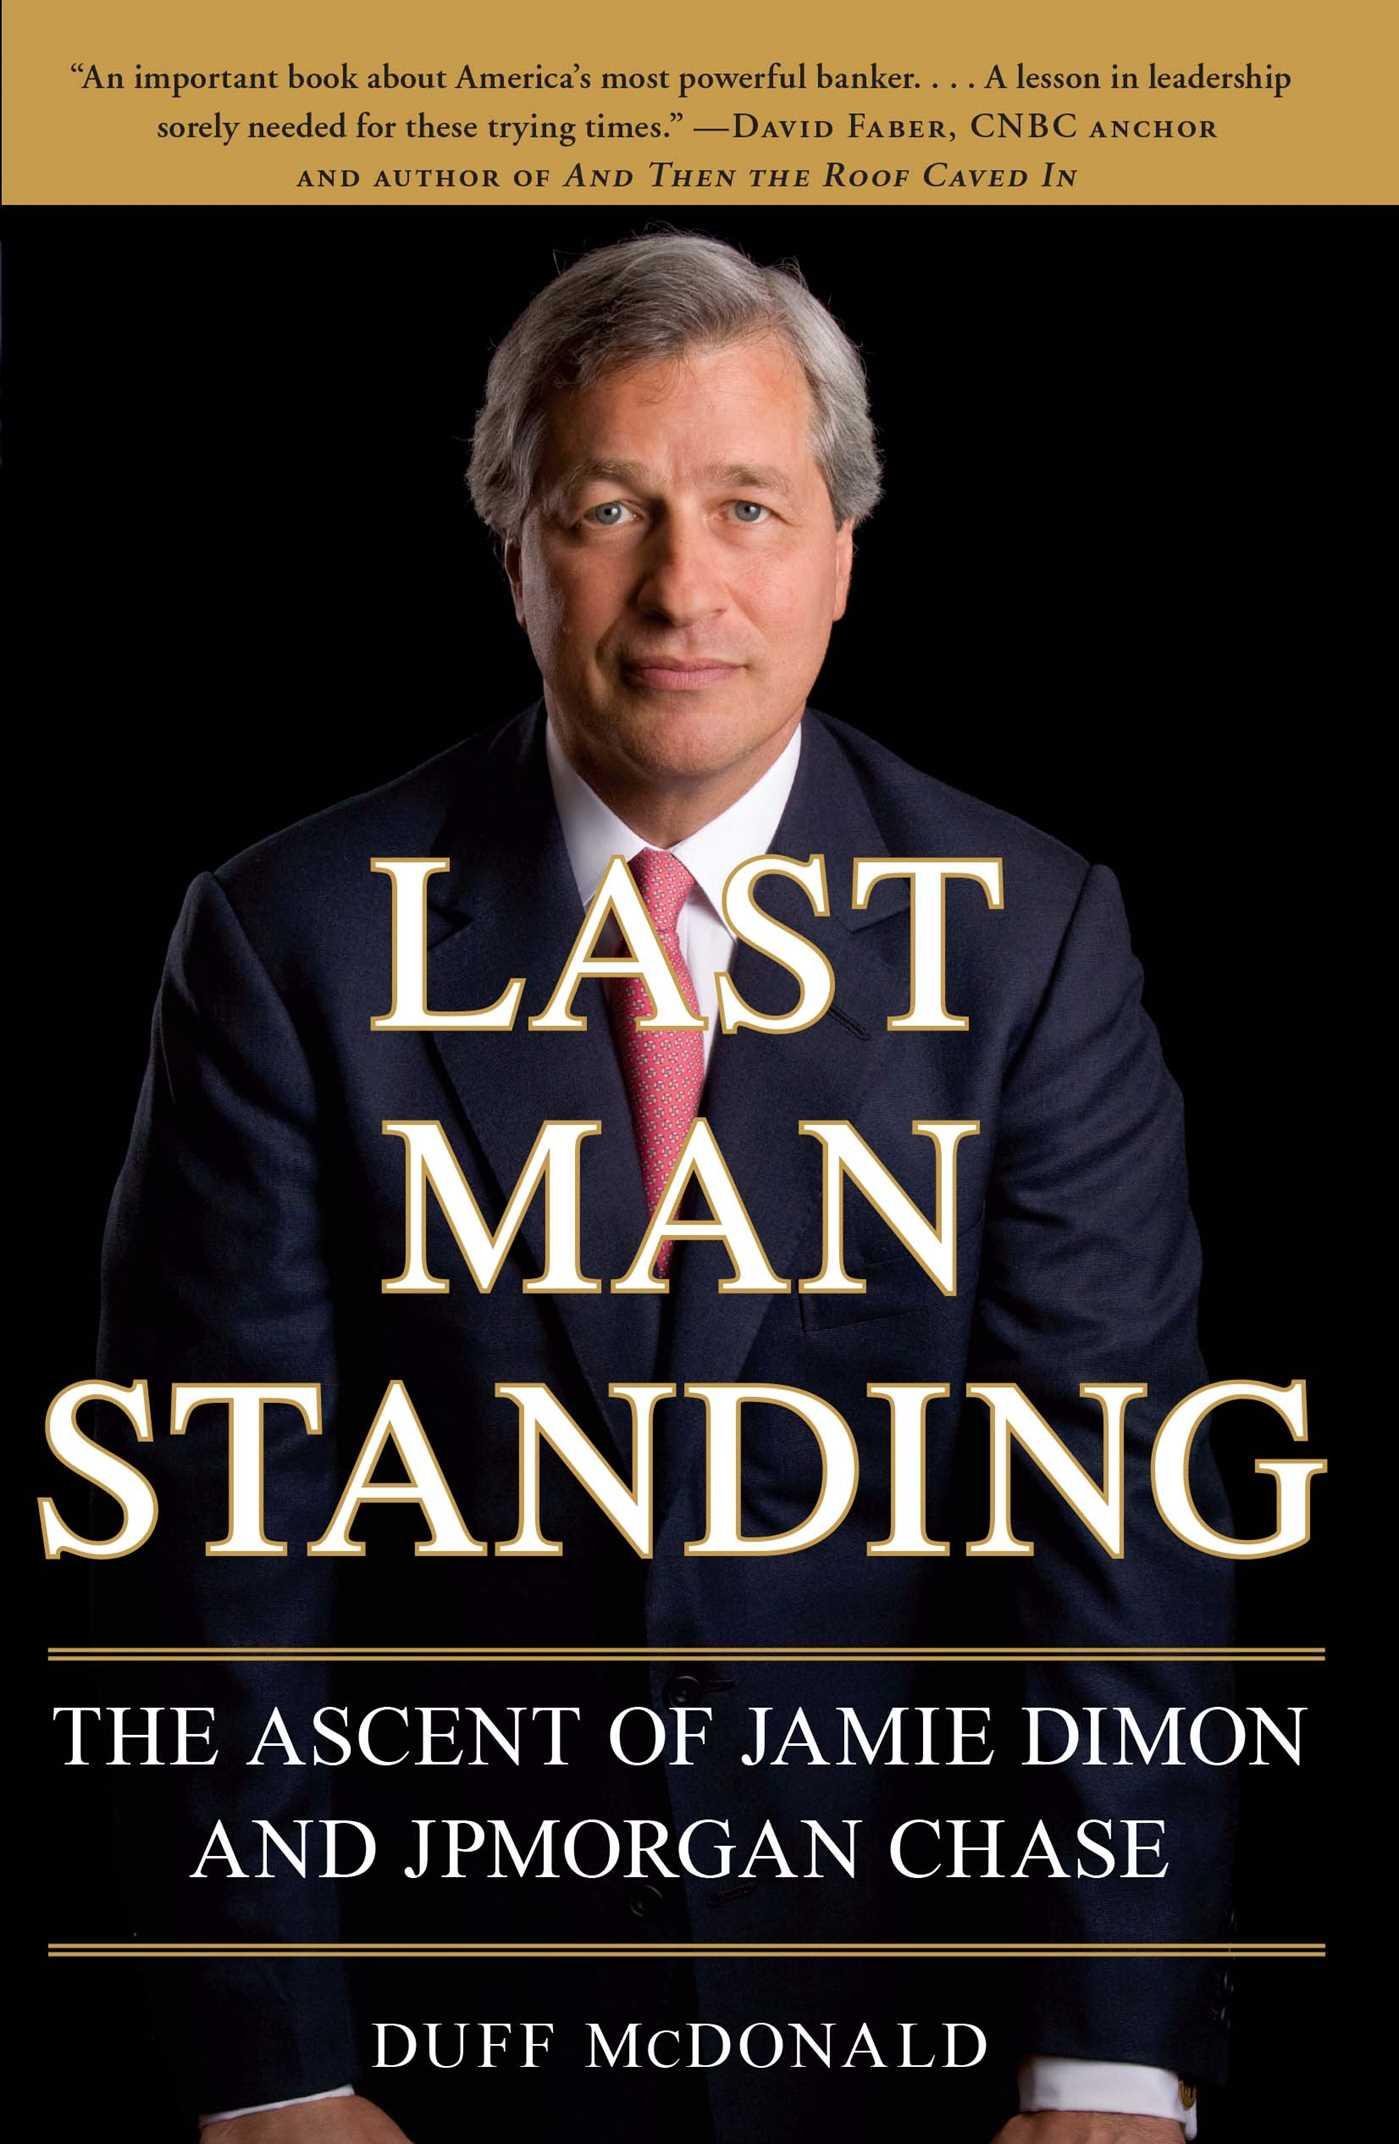 Download Ebook Last Man Standing by Duff McDonald Pdf